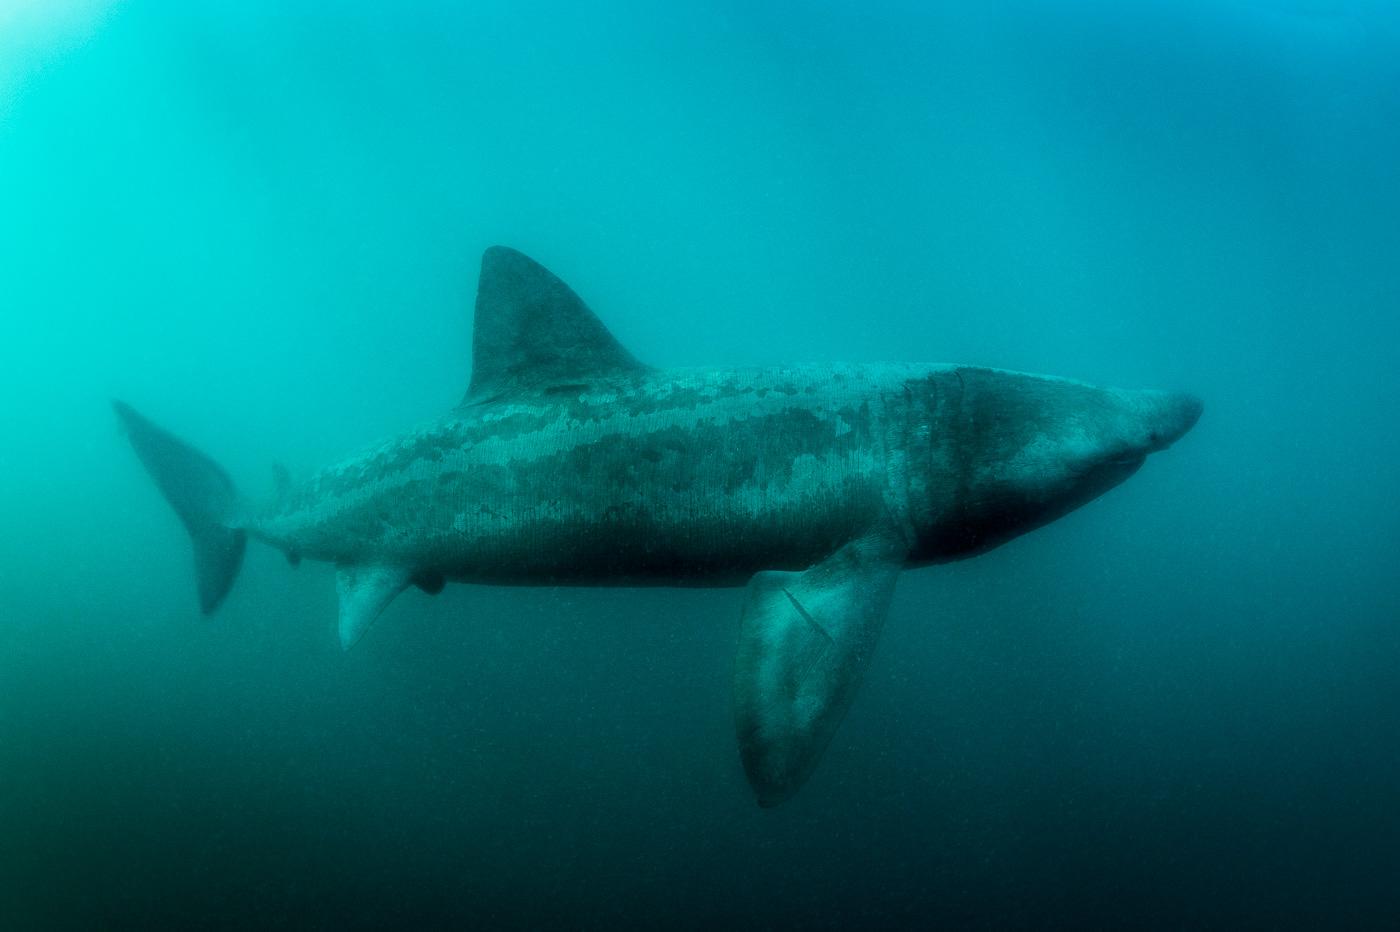 basking_shark_deep_underwater_ireland